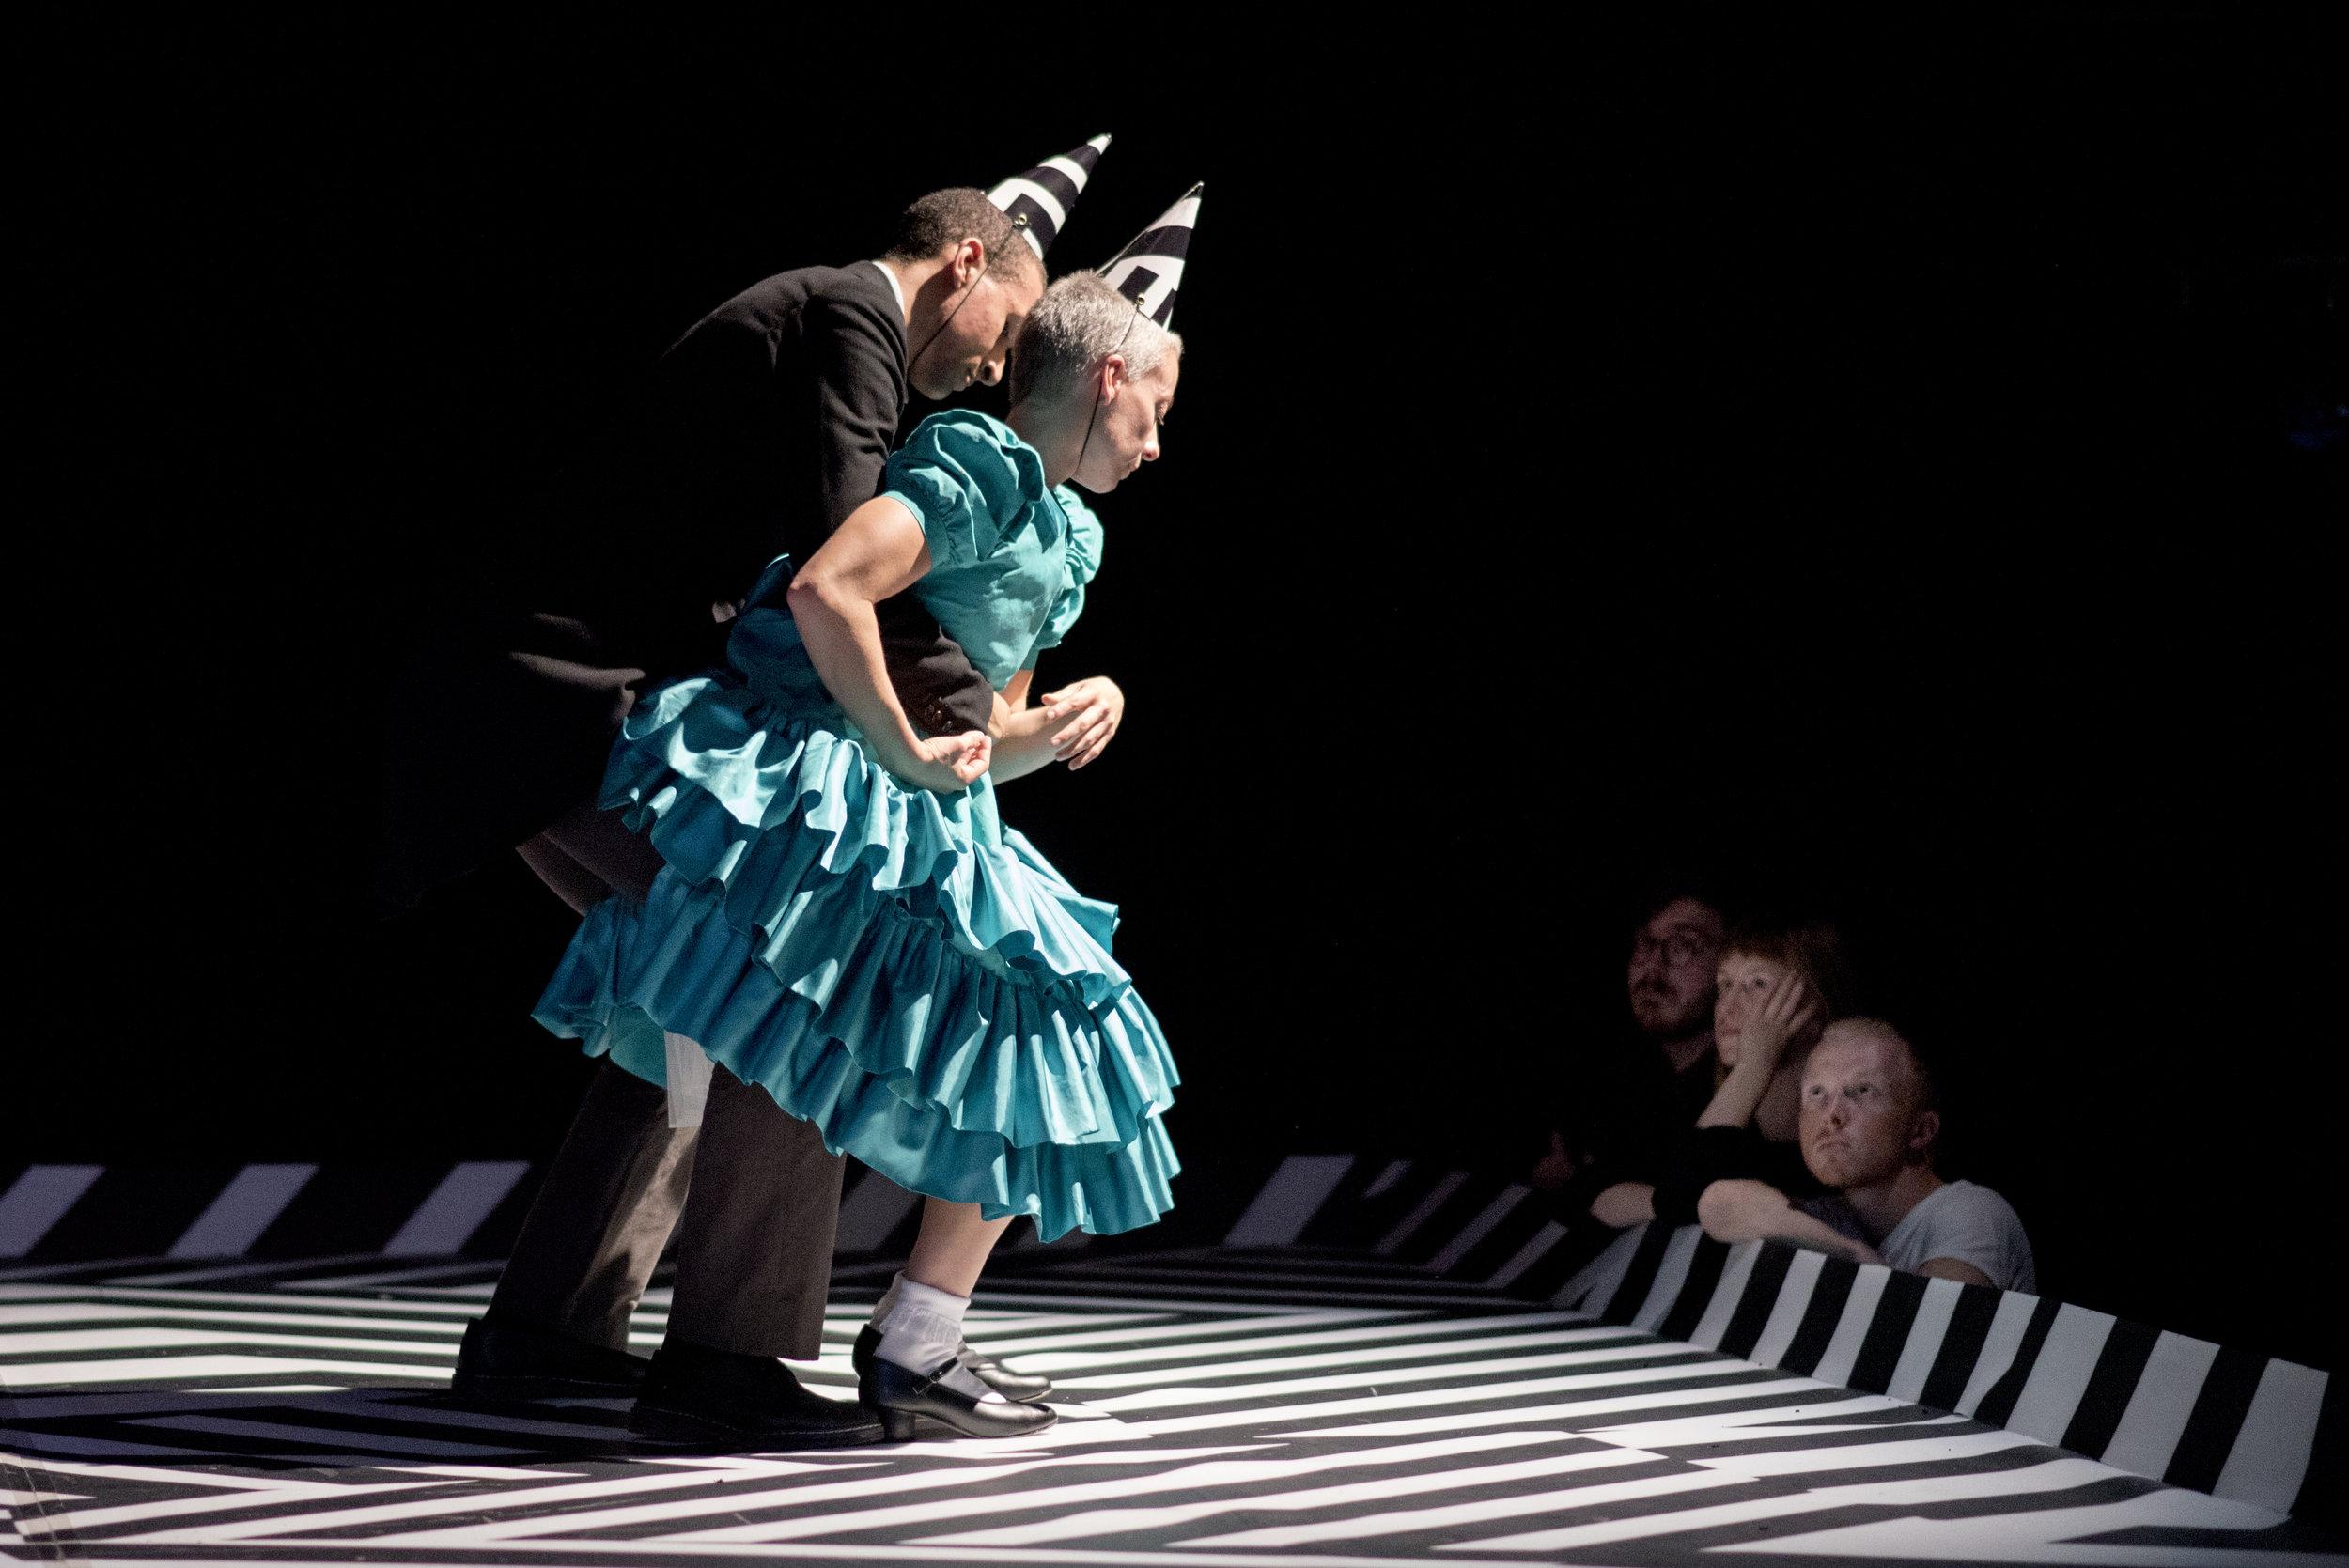 DeadClub_Requardt&Rosenberg_Dancers_RubenBrown&ValentinaFormenti-PhotoCamillaGreenwell.jpg